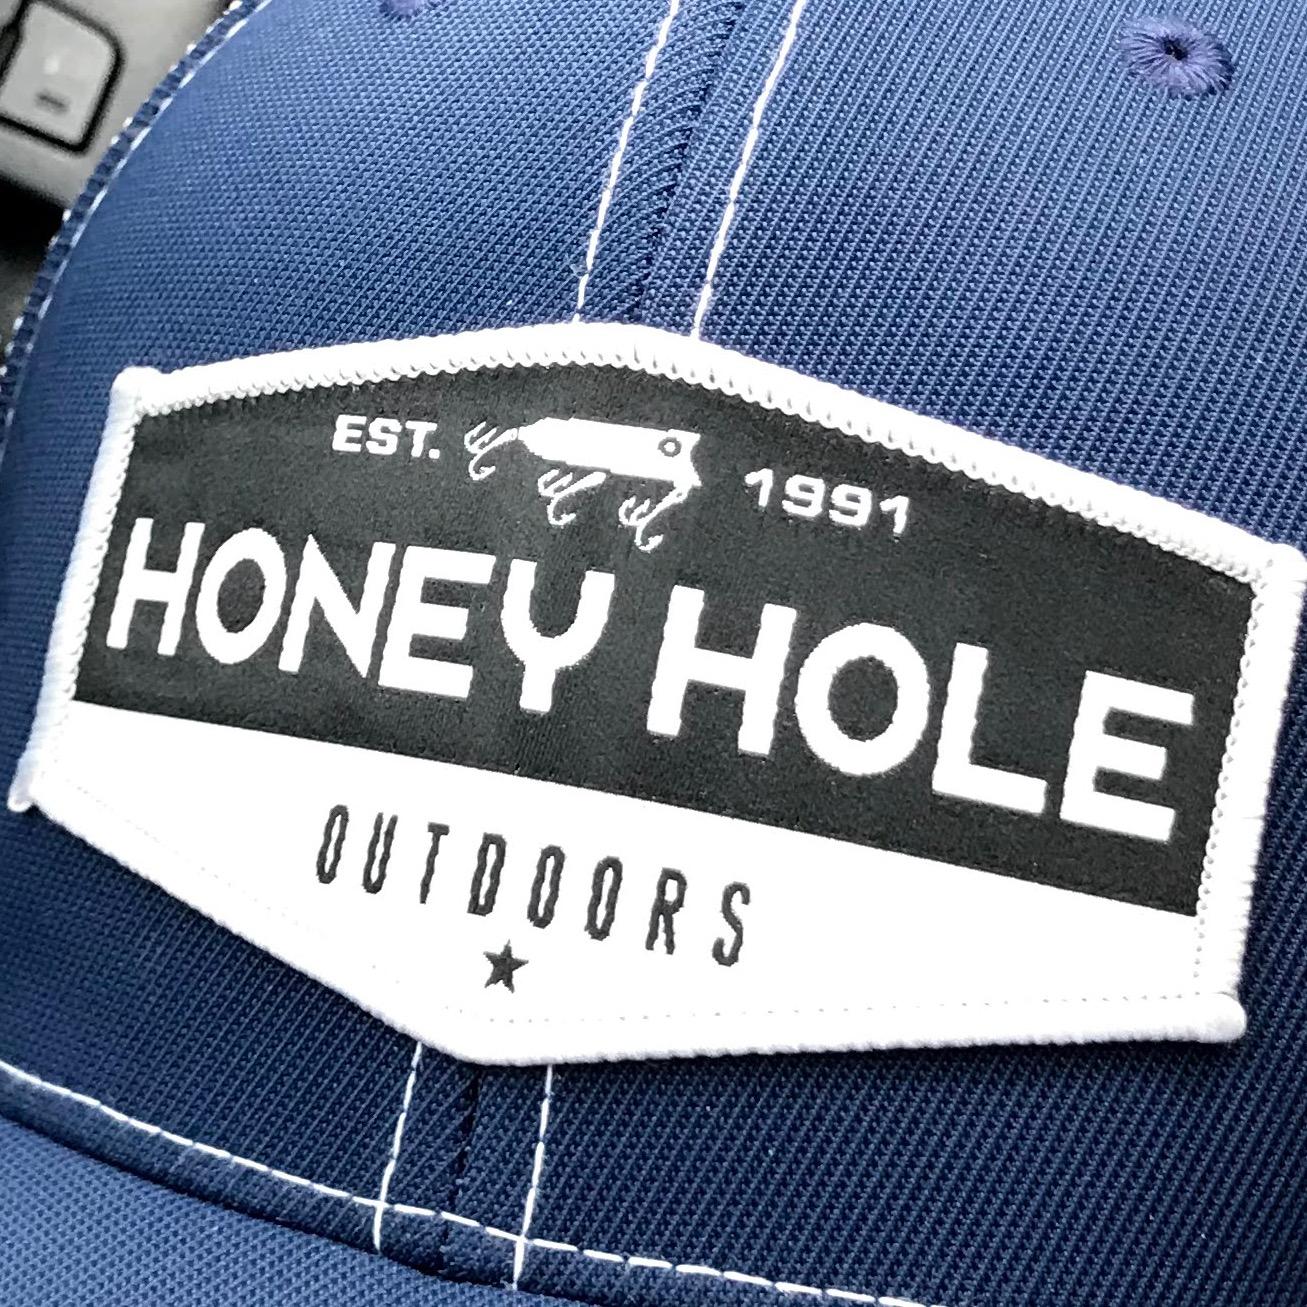 Fishing The LoneStar Honey Hole Hats and Gear (use code LONESTAR20) Link Thumbnail | Linktree